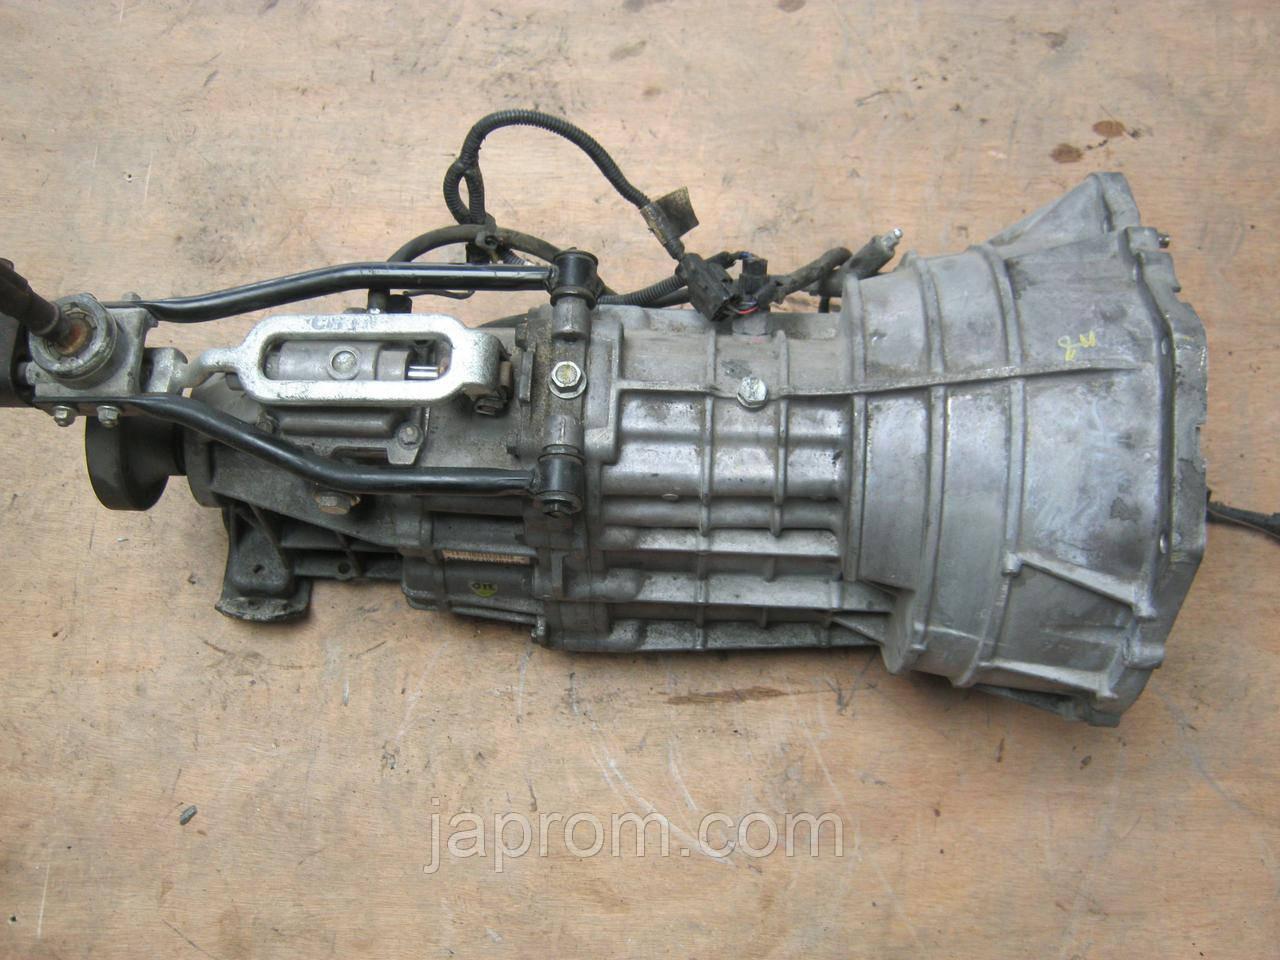 МКПП механічна коробка передач SsangYong Rodius 2WD 2.7 XDI G31020-21010